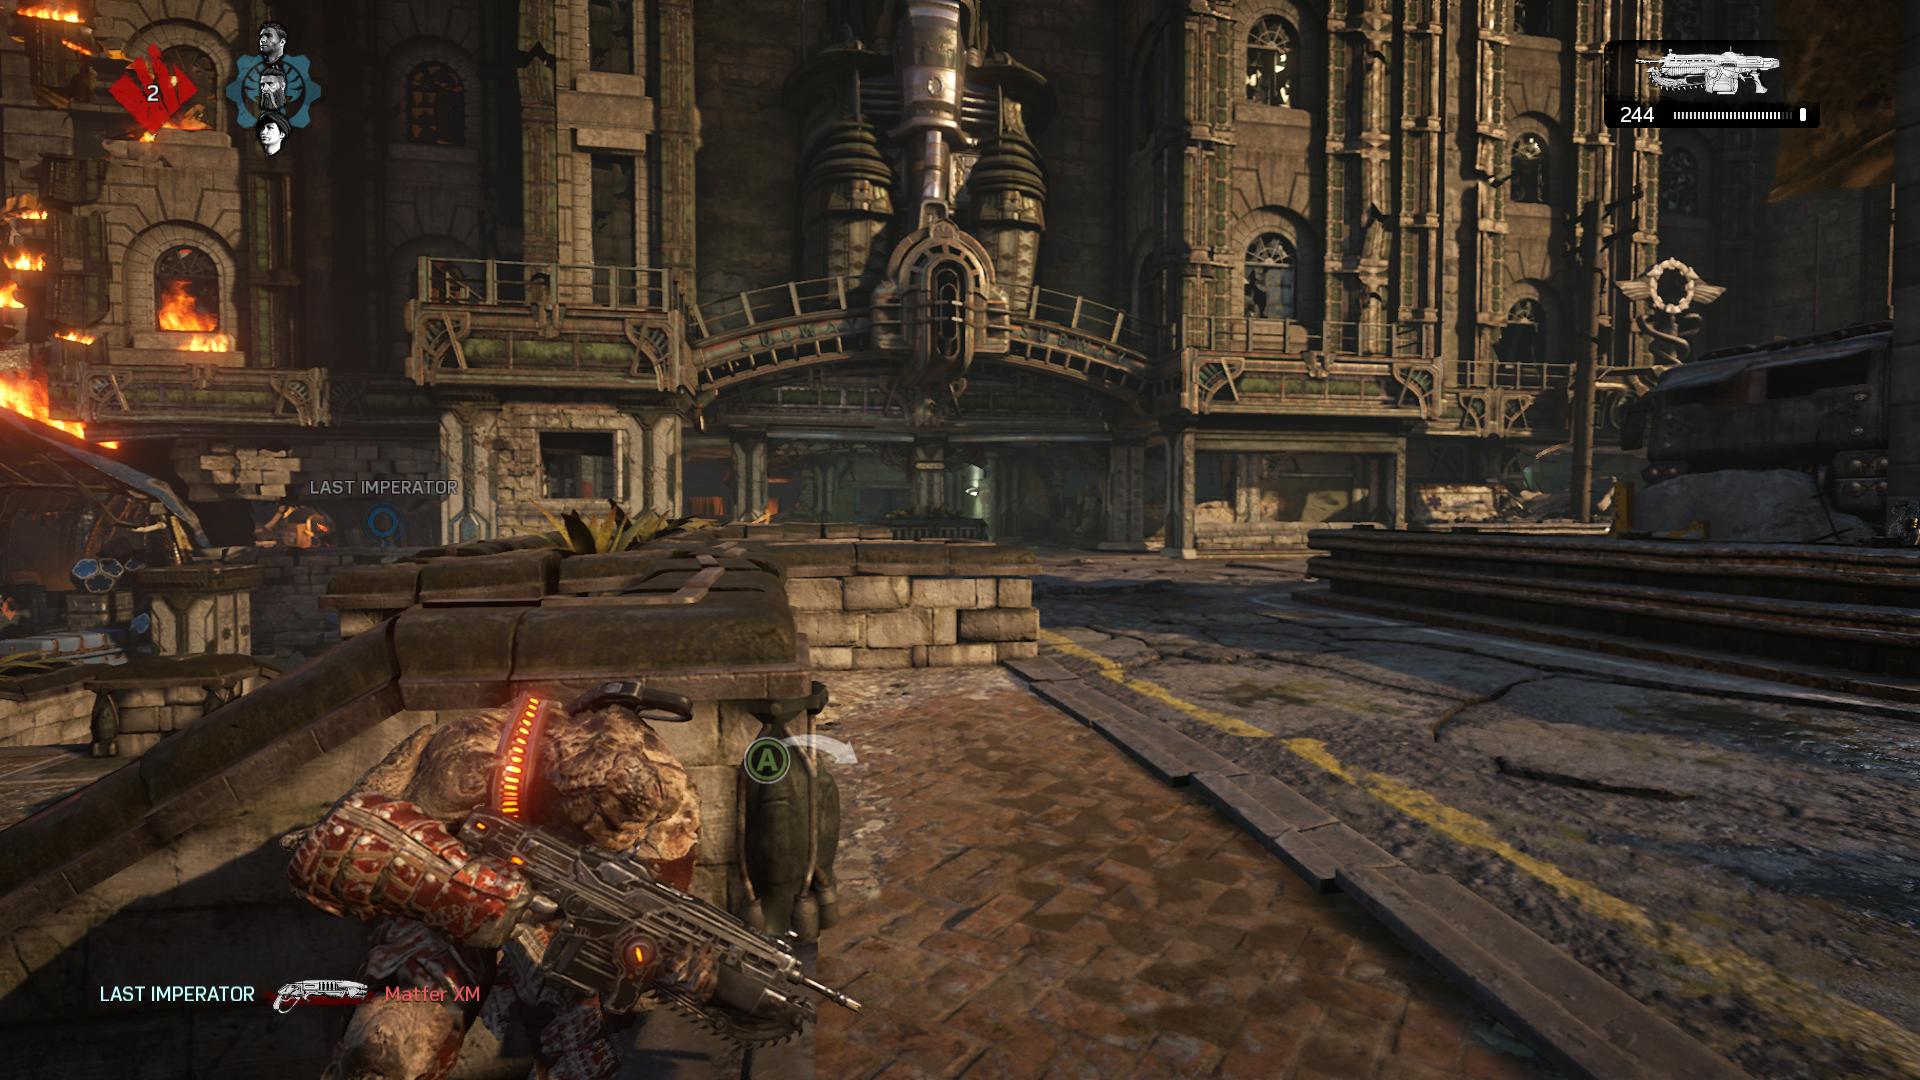 Gears of War 4 Multiplayer